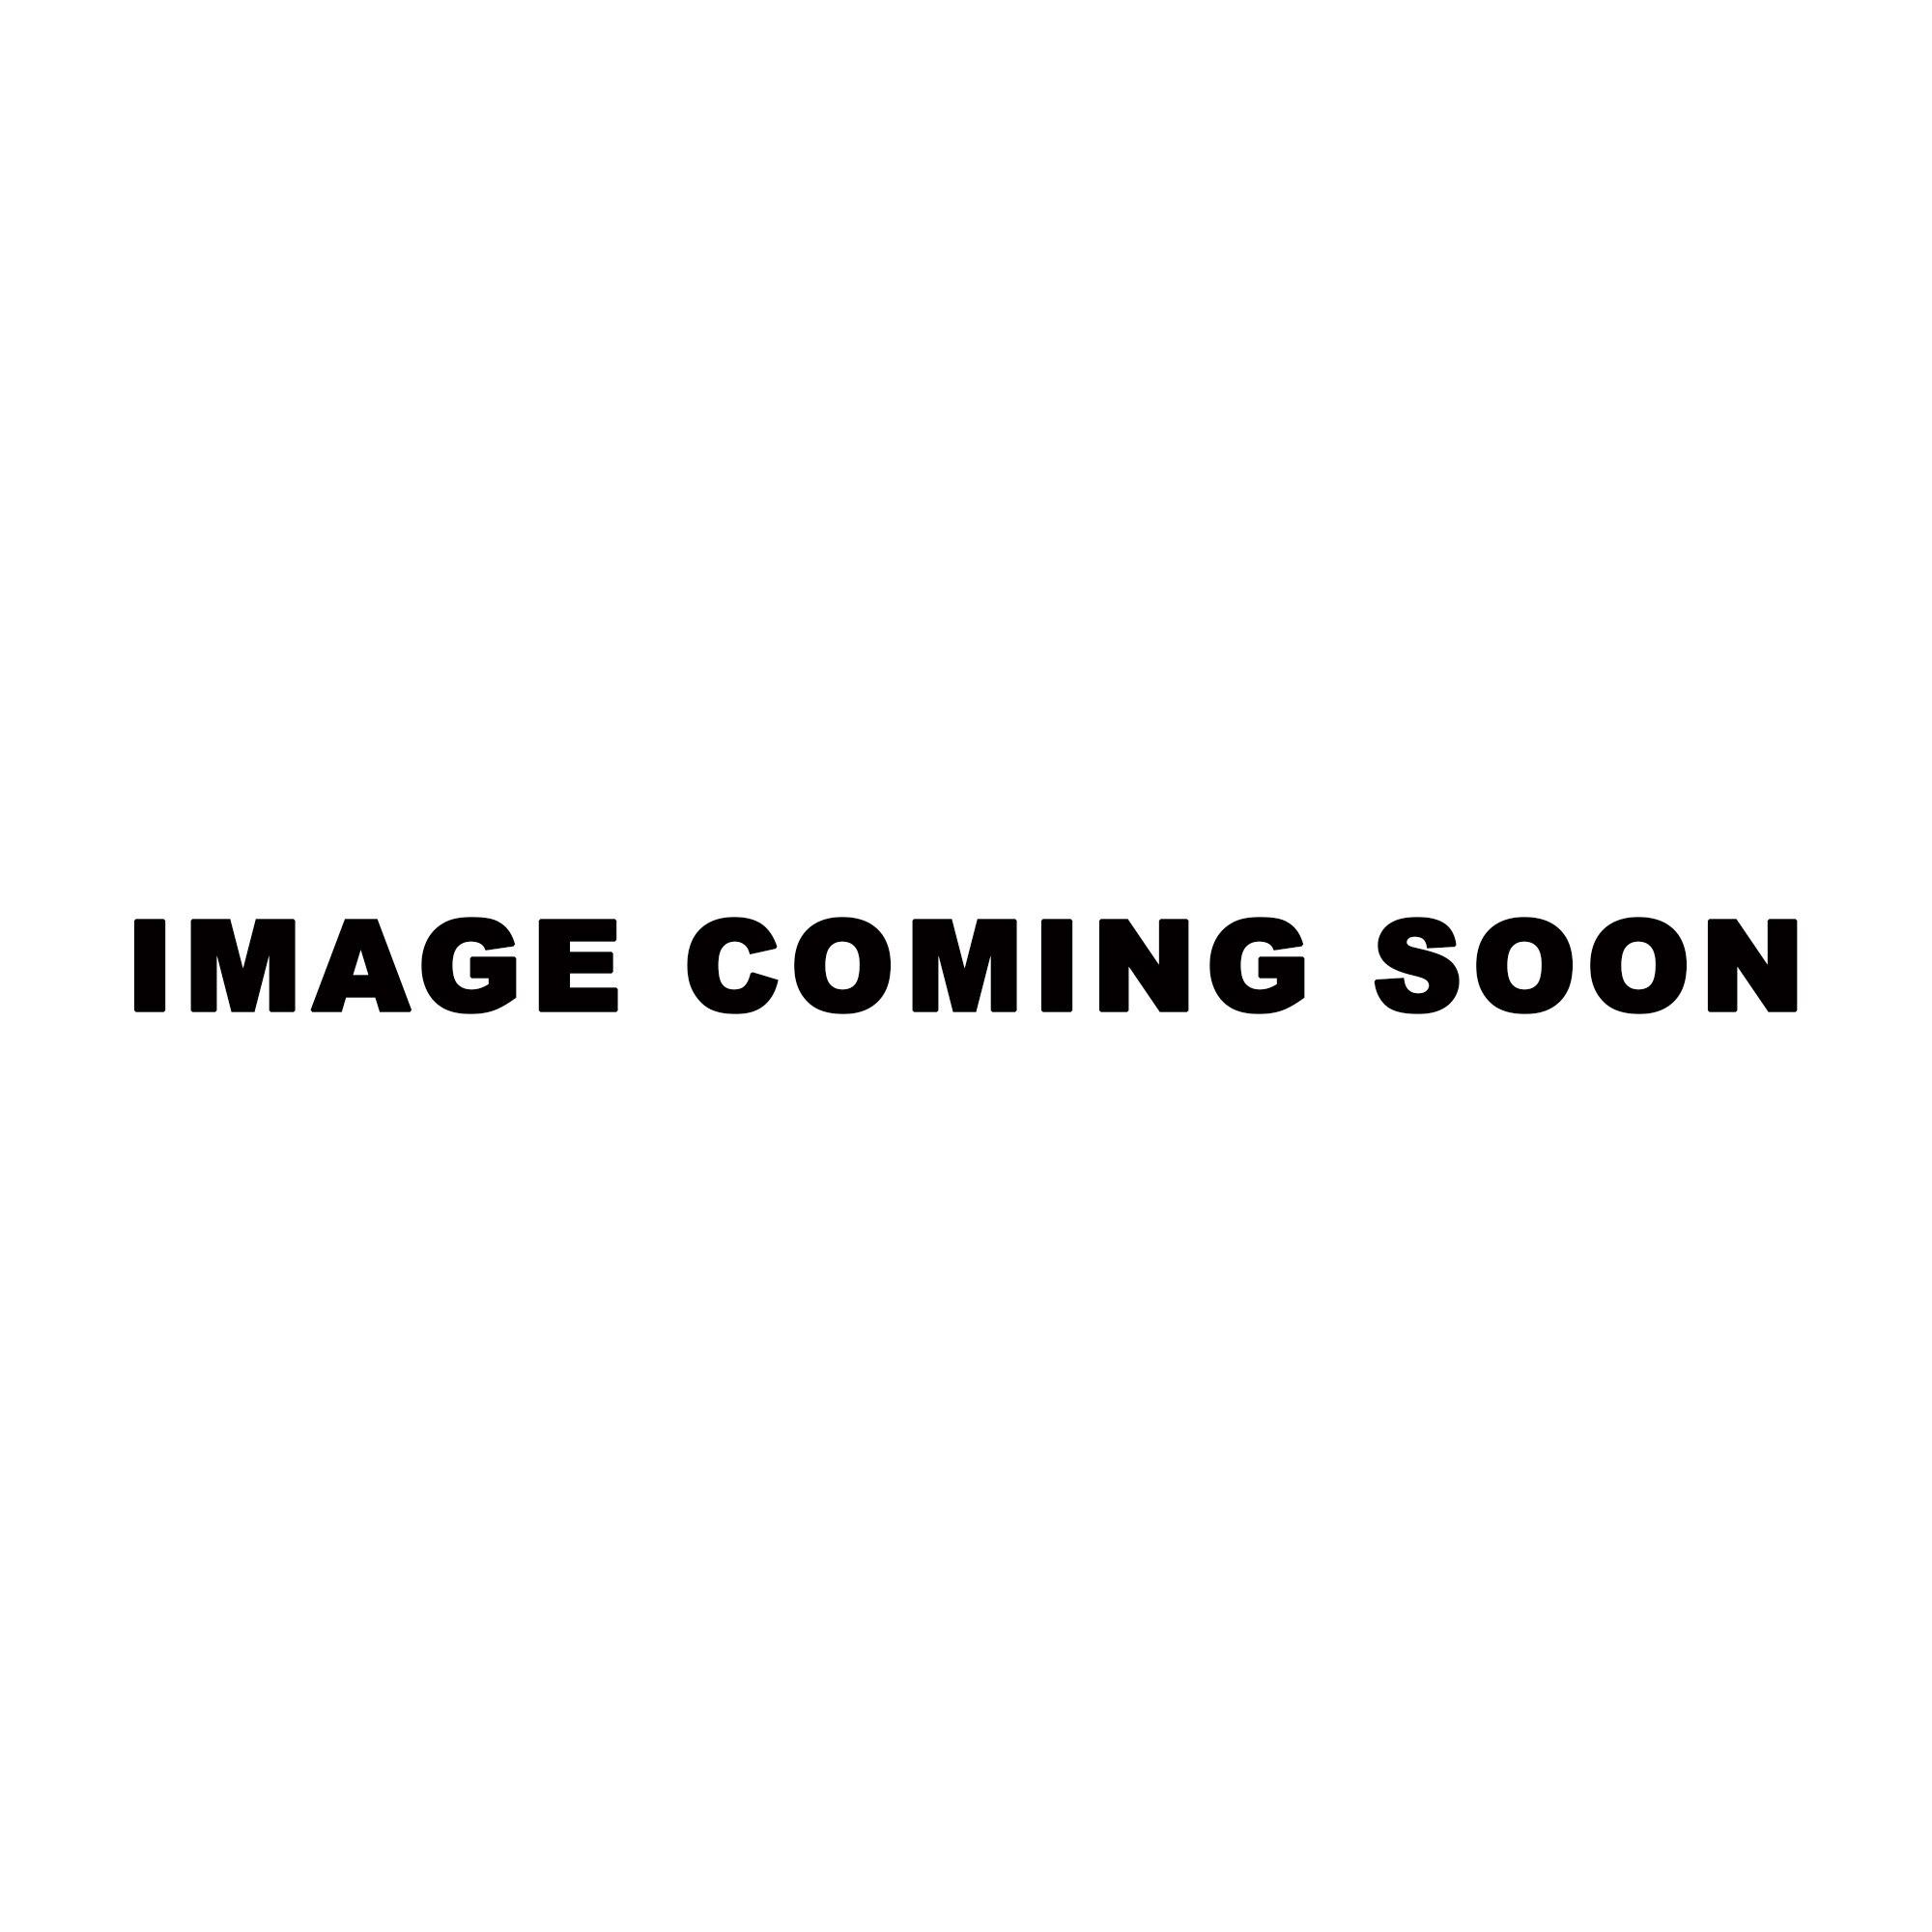 Usc Trojans State Shape Acrylic Metallic Auto Emblem